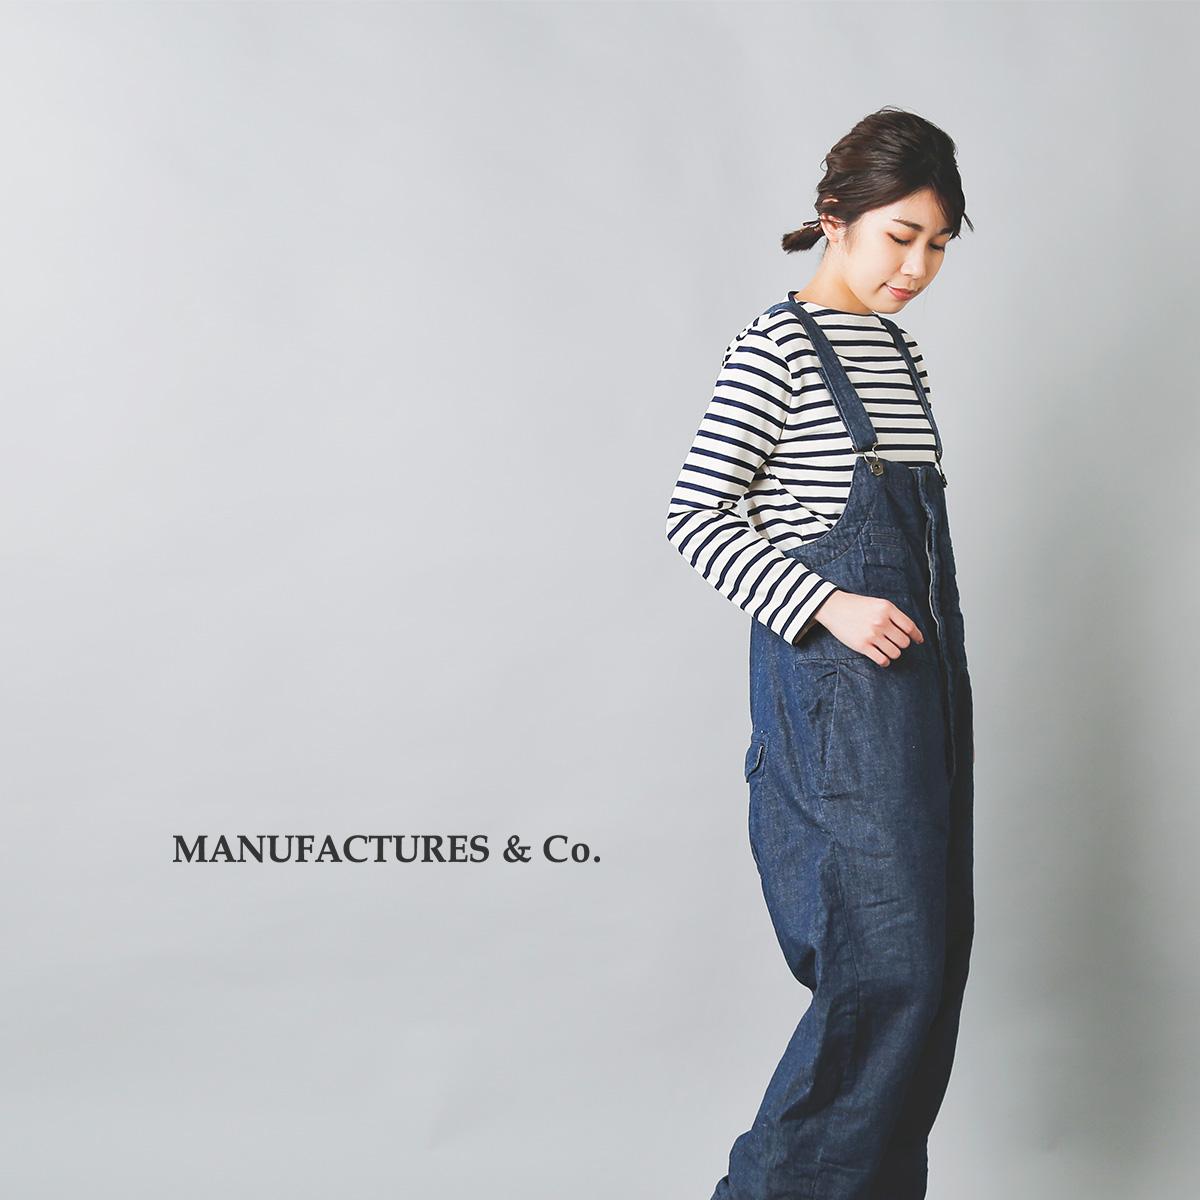 Manufactures&Co.(マニュファクチャーズアンドコー)デニムオーバーオール craftman-overalls